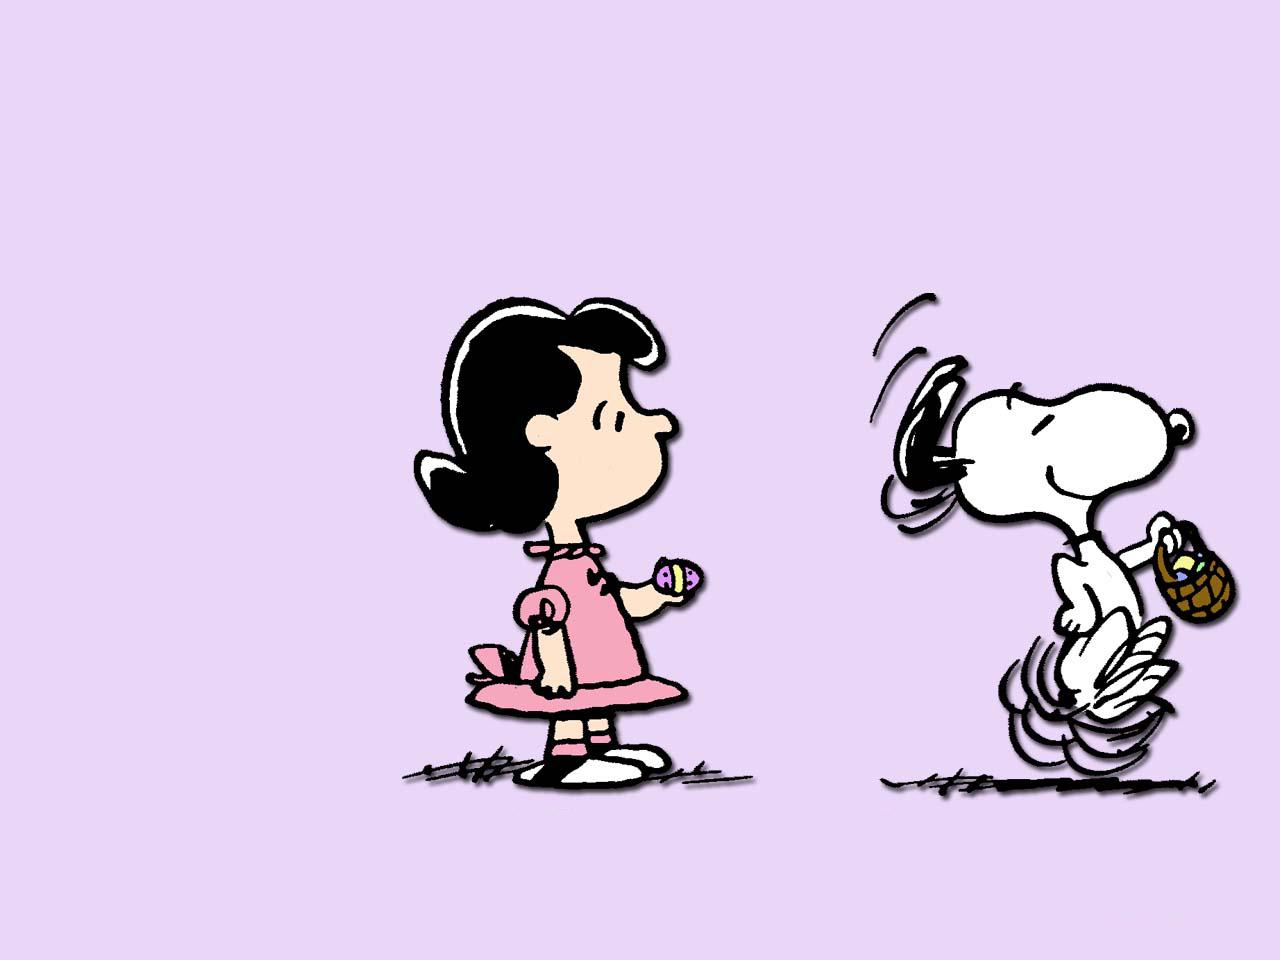 44 Free Snoopy Wallpaper For Ipad On Wallpapersafari